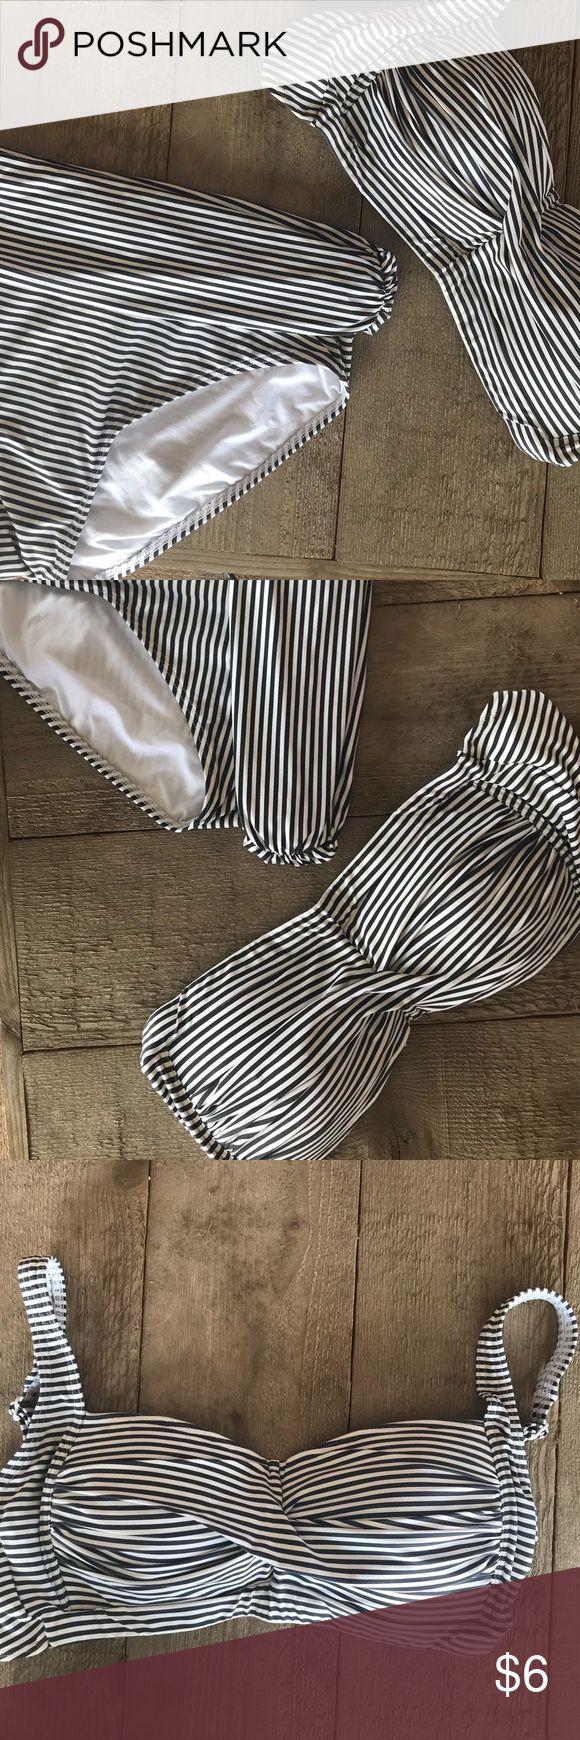 👙 Two piece nautical, fold over bikini 👙 Blue and white nautical bikini. Full coverage bottom and top. Sturdy straps that are adjustable and very comfortable. Used. bond eye Swim Bikinis